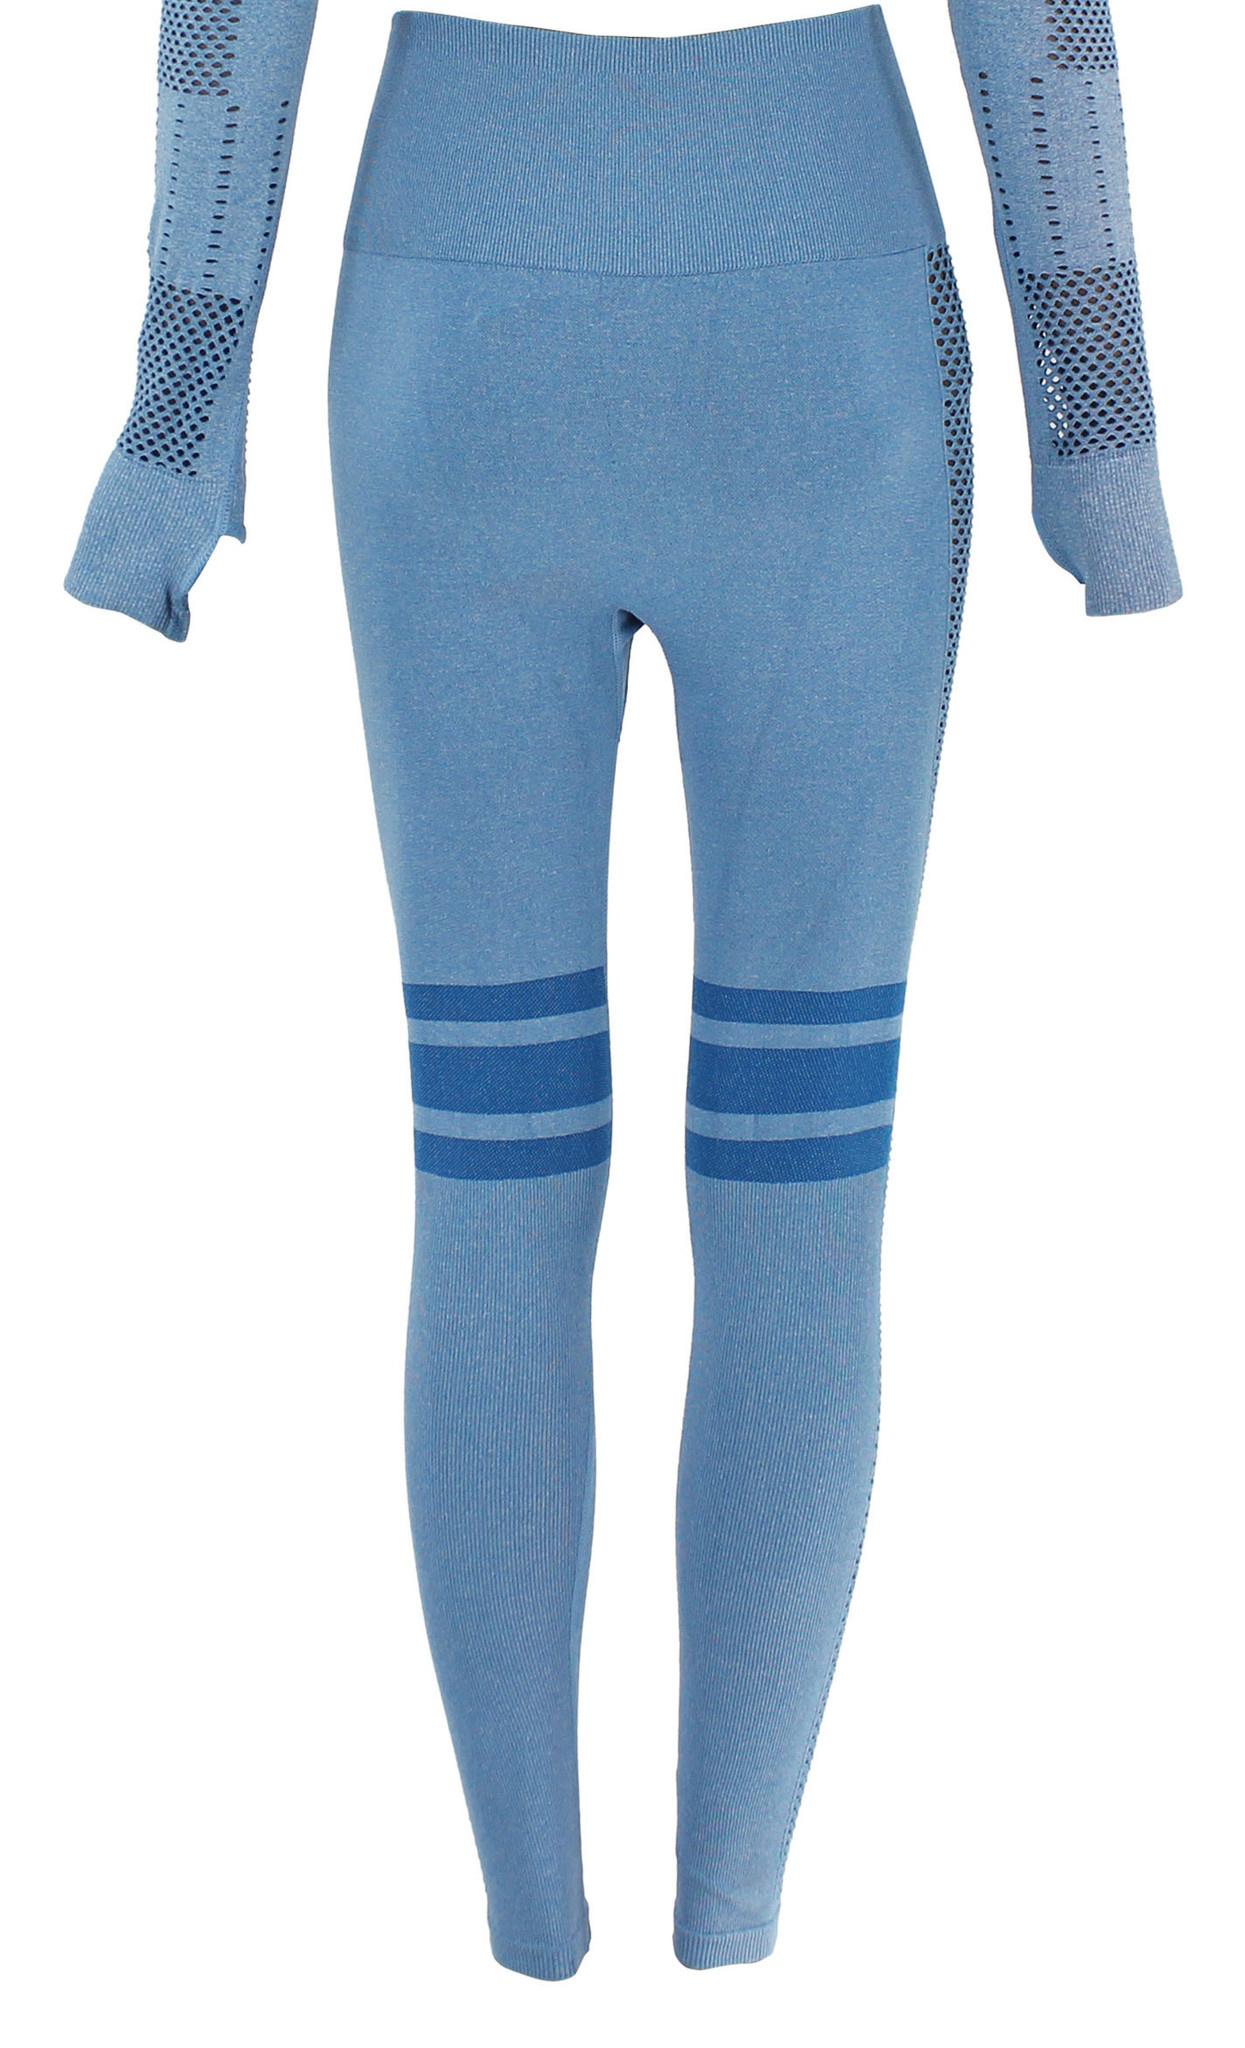 Sportlegging Blue stripes